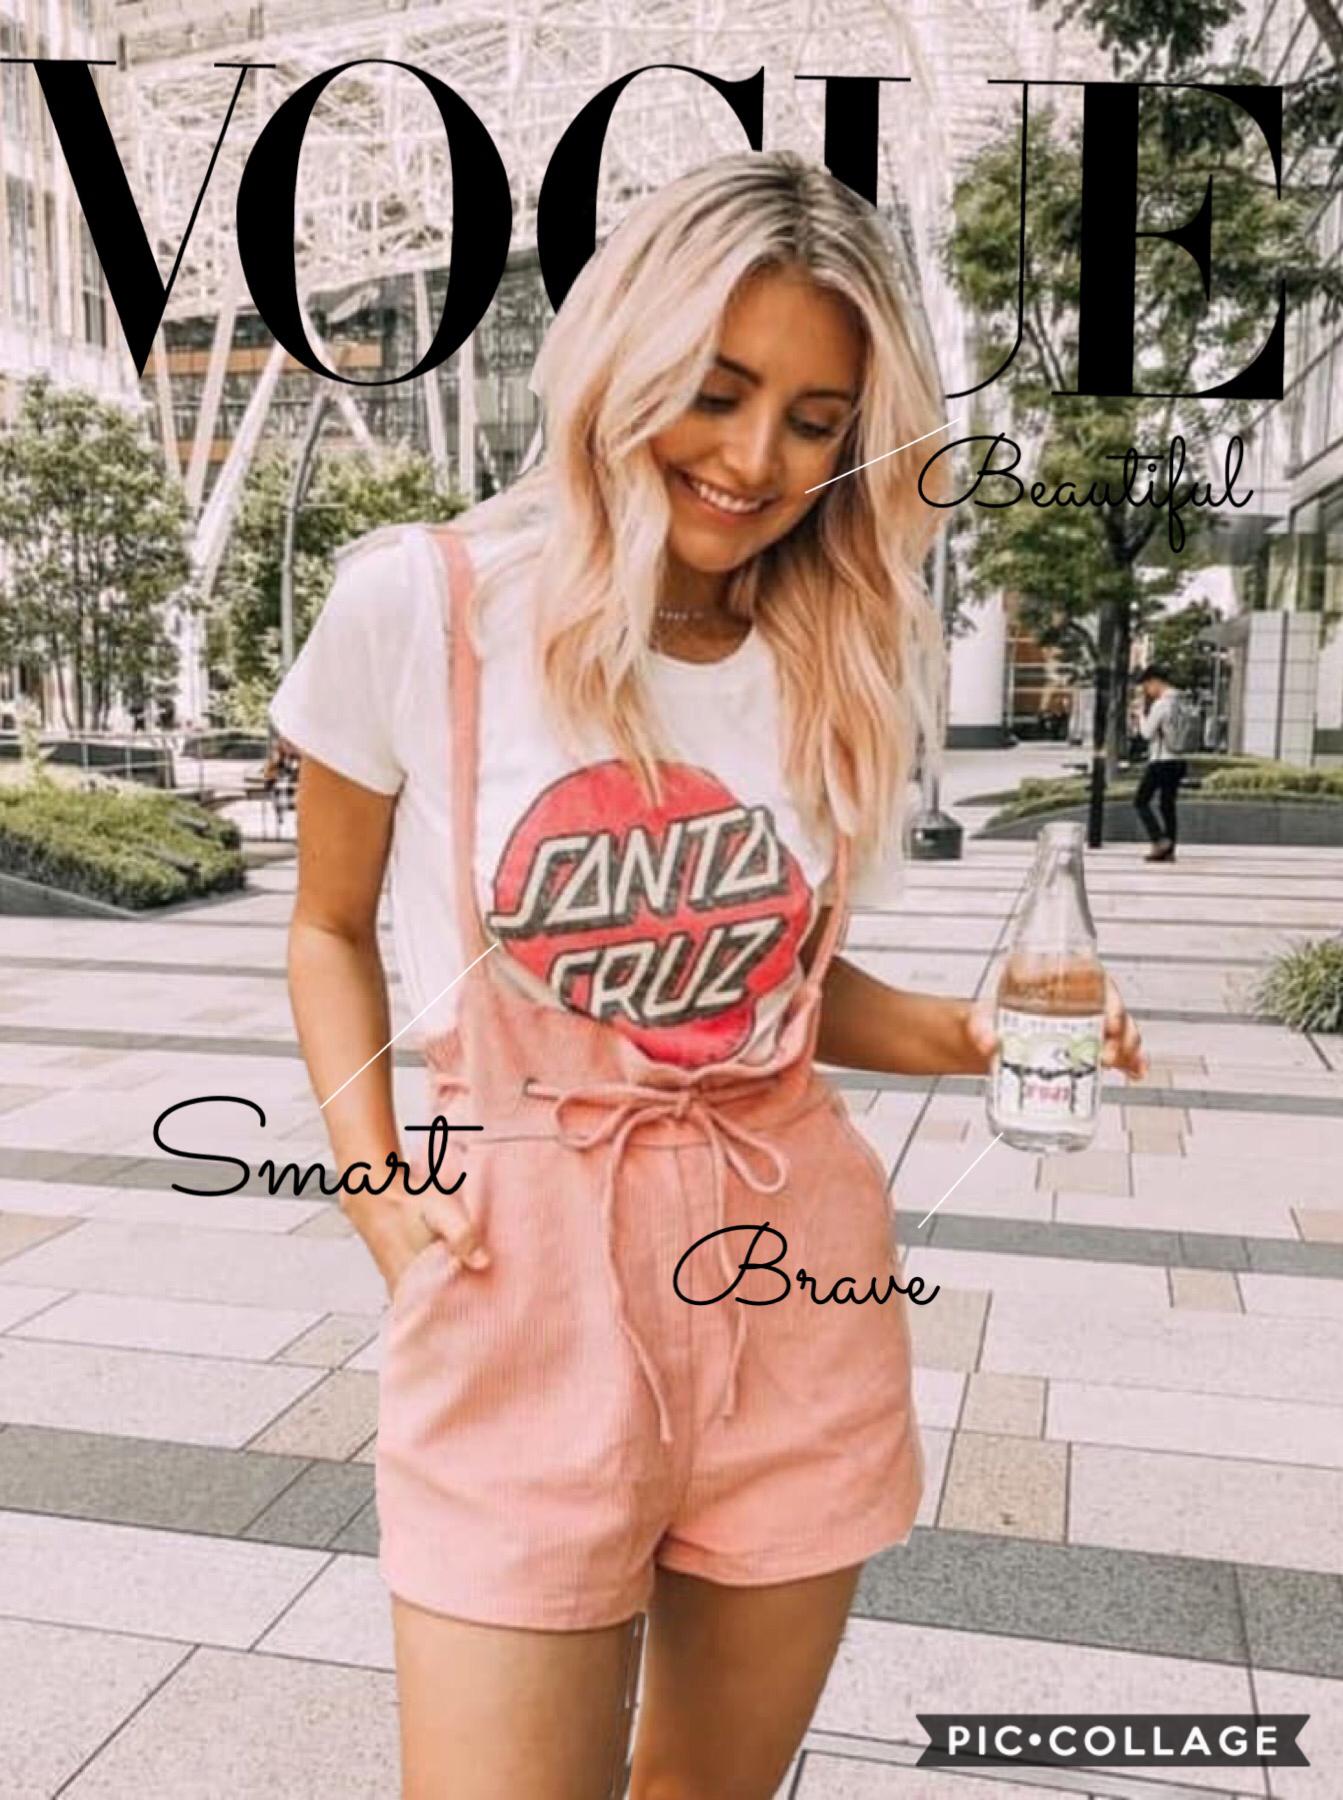 Vogue #3